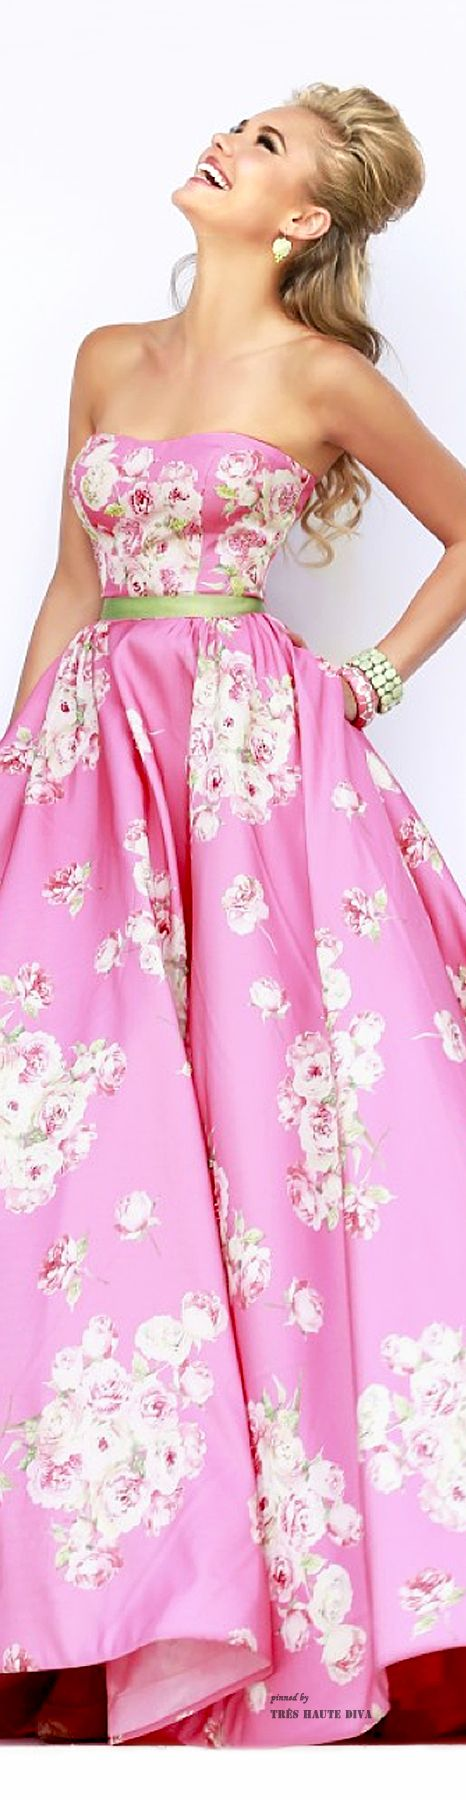 Sherri Hill ~ Spring Pink Floral Maxi, 2015